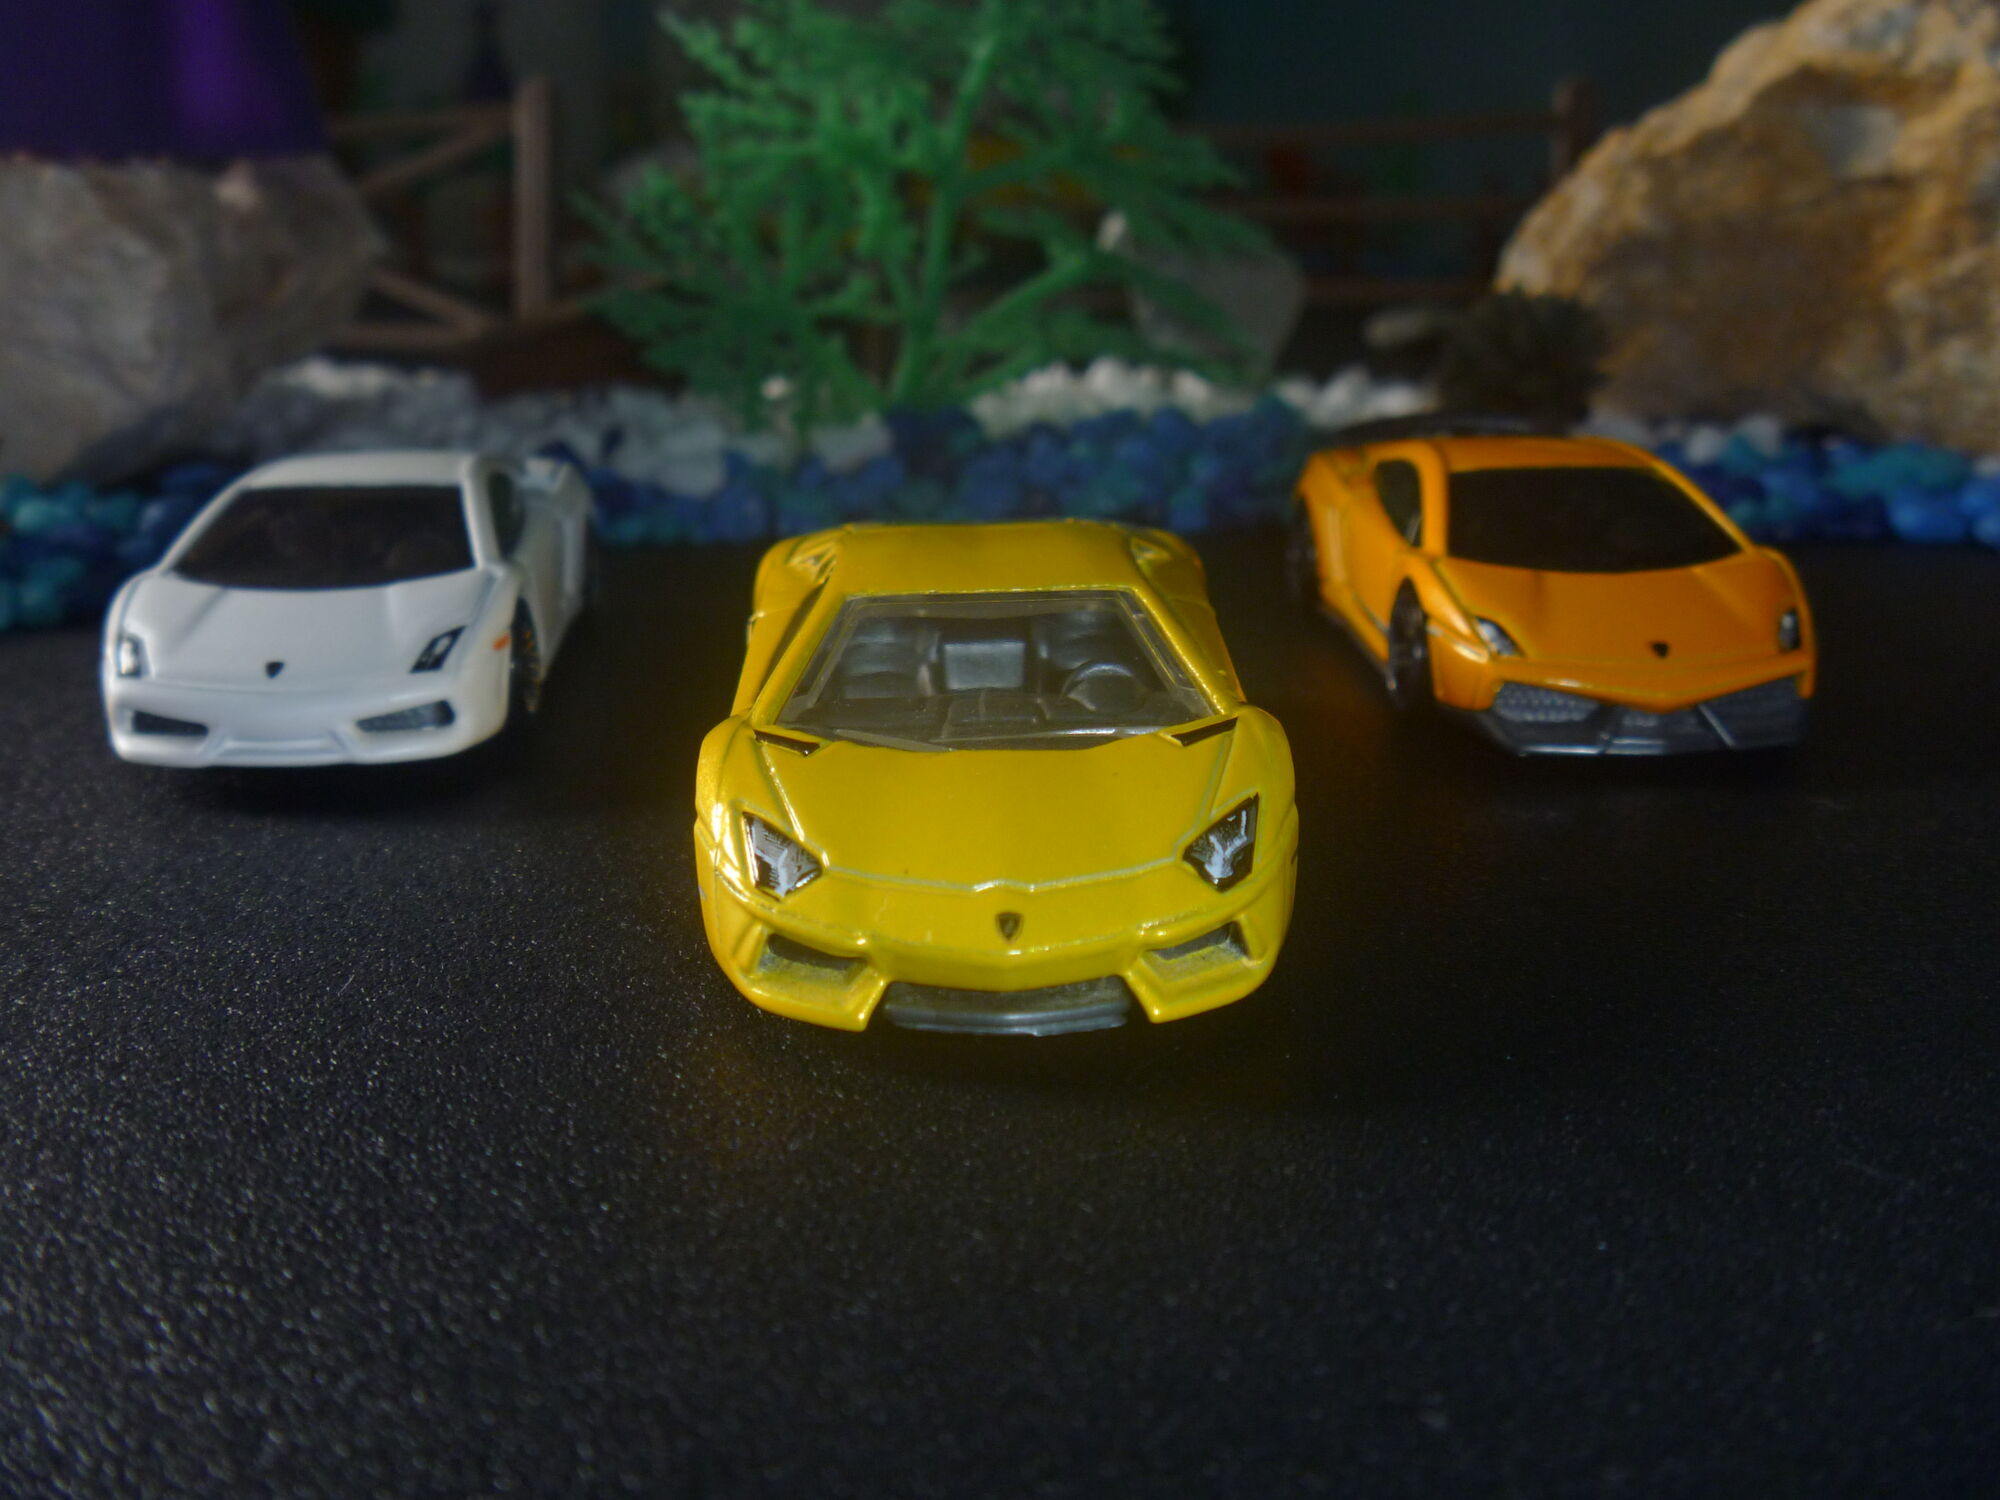 2000?cb=20130422161027 Surprising Lamborghini Gallardo Hot Wheels Wiki Cars Trend